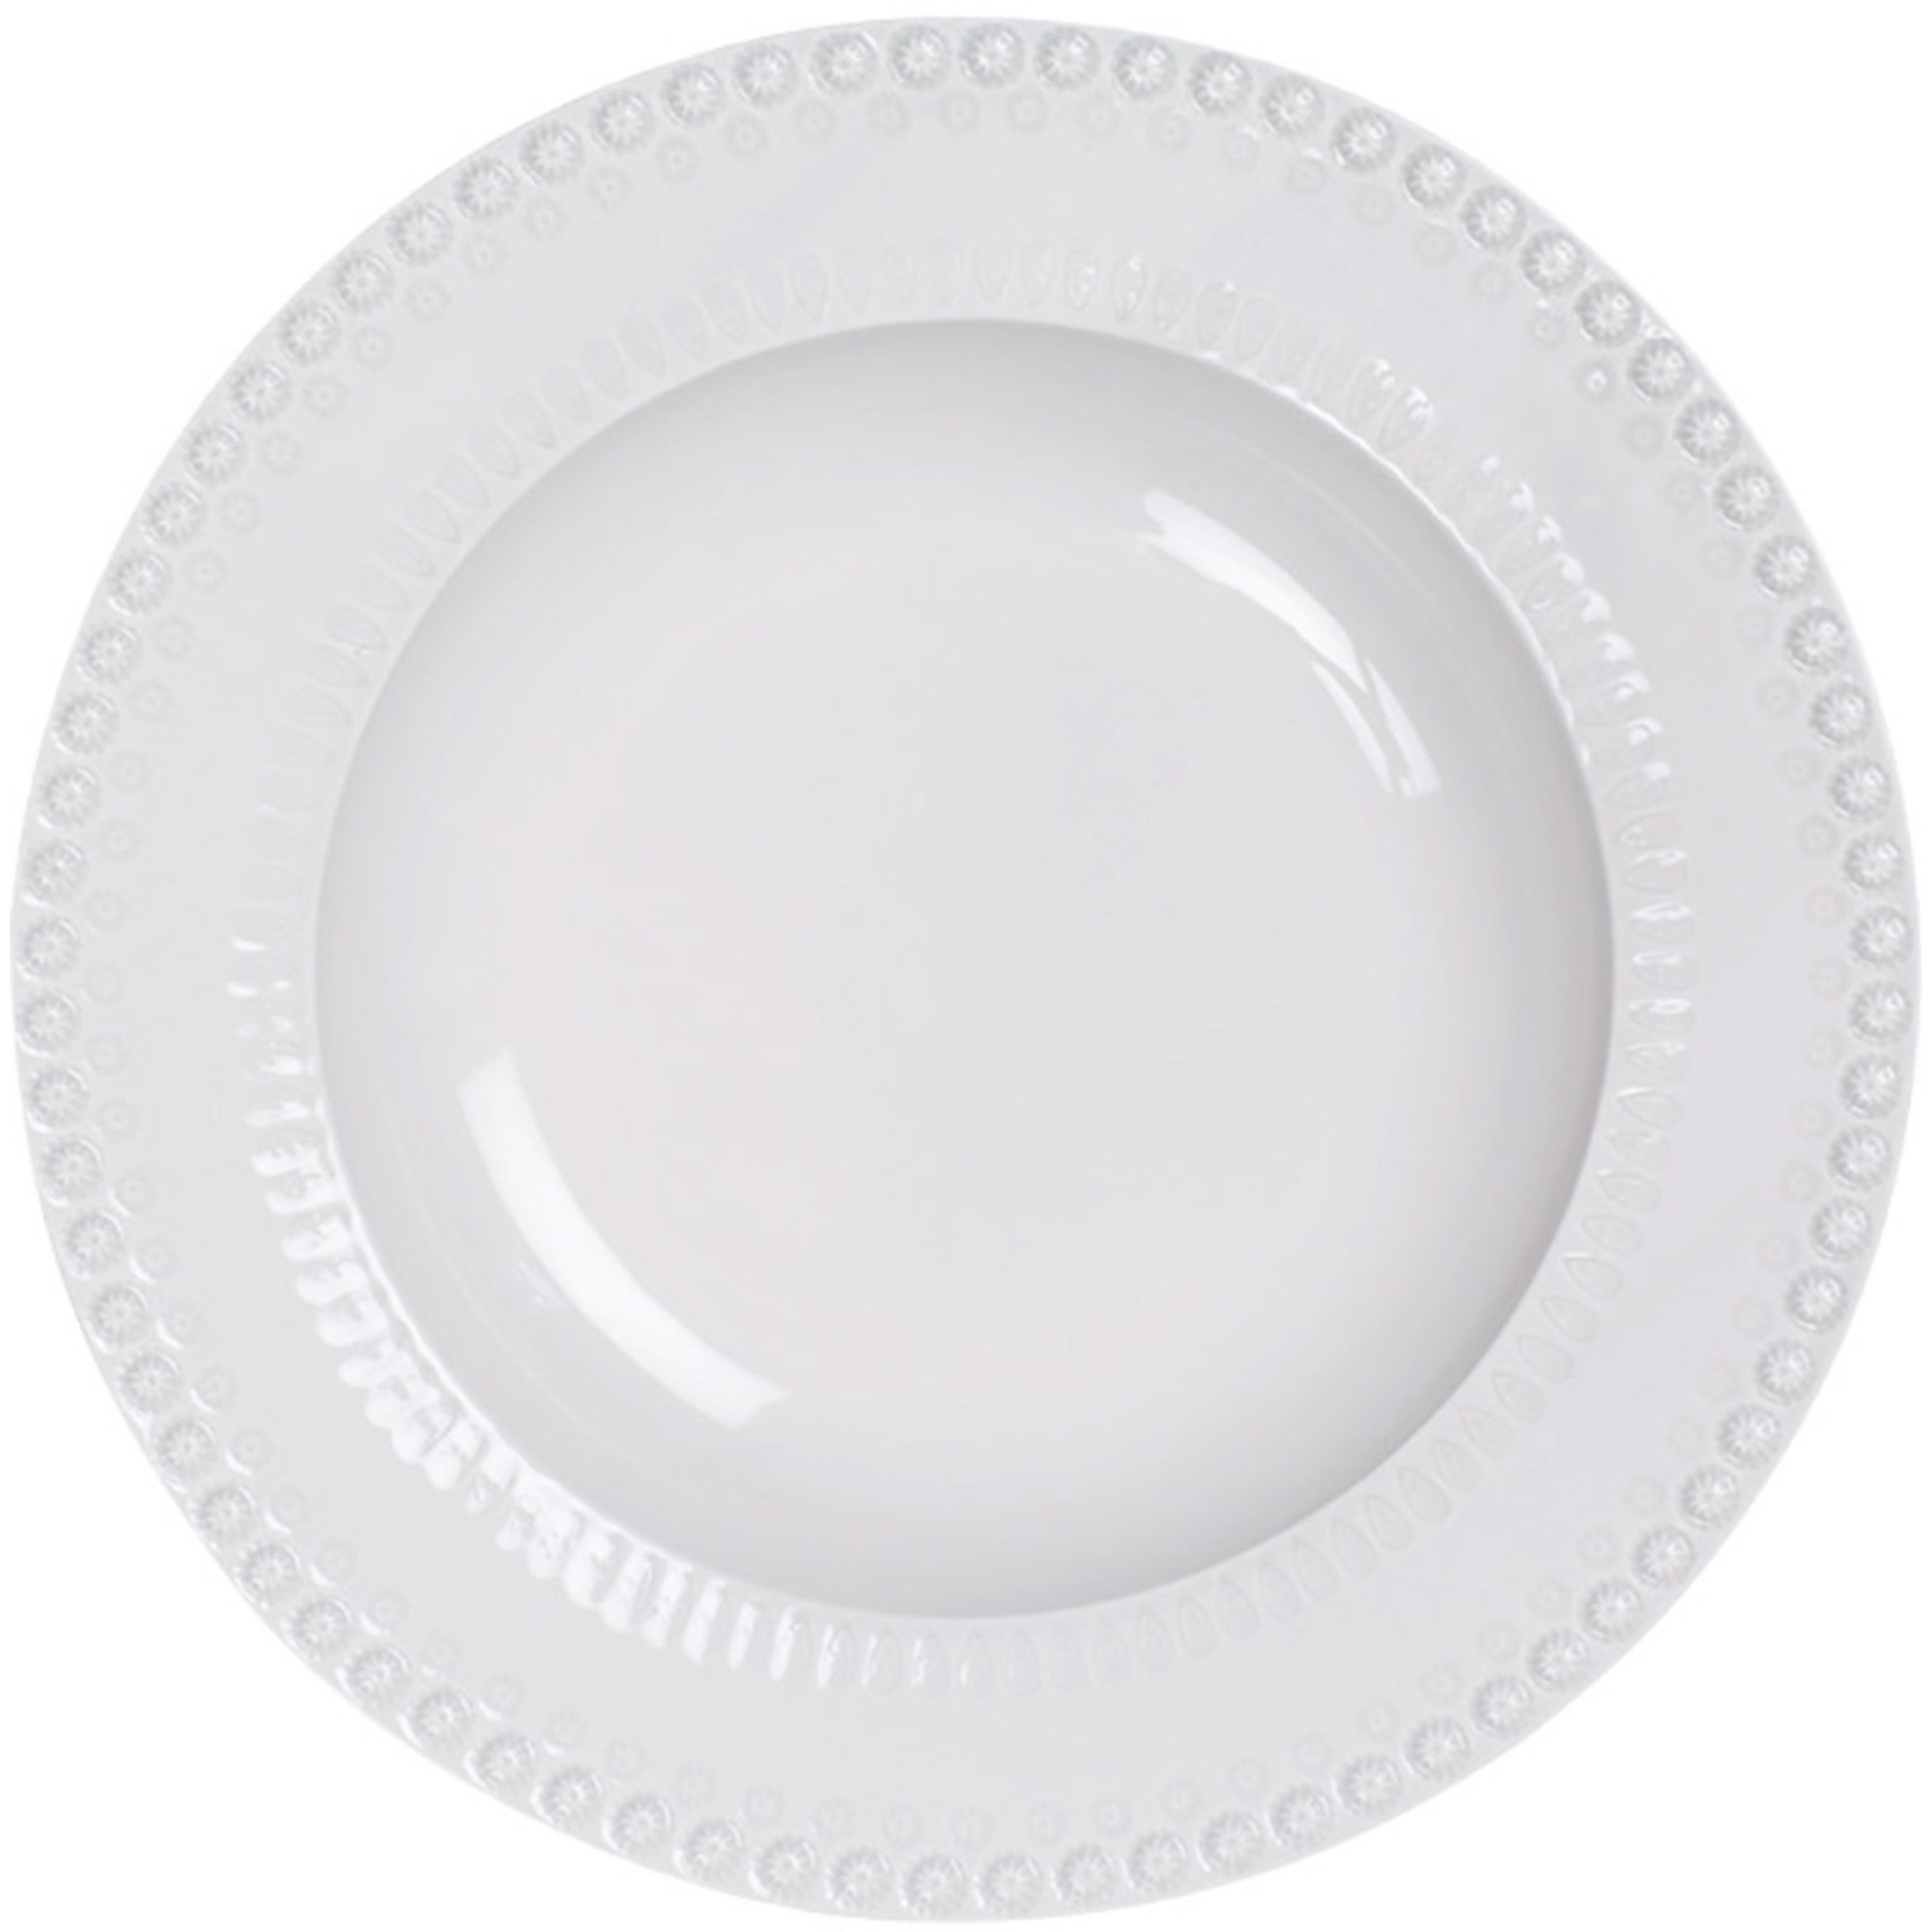 PotteryJo Daisy Pastatallrik 35 cm White